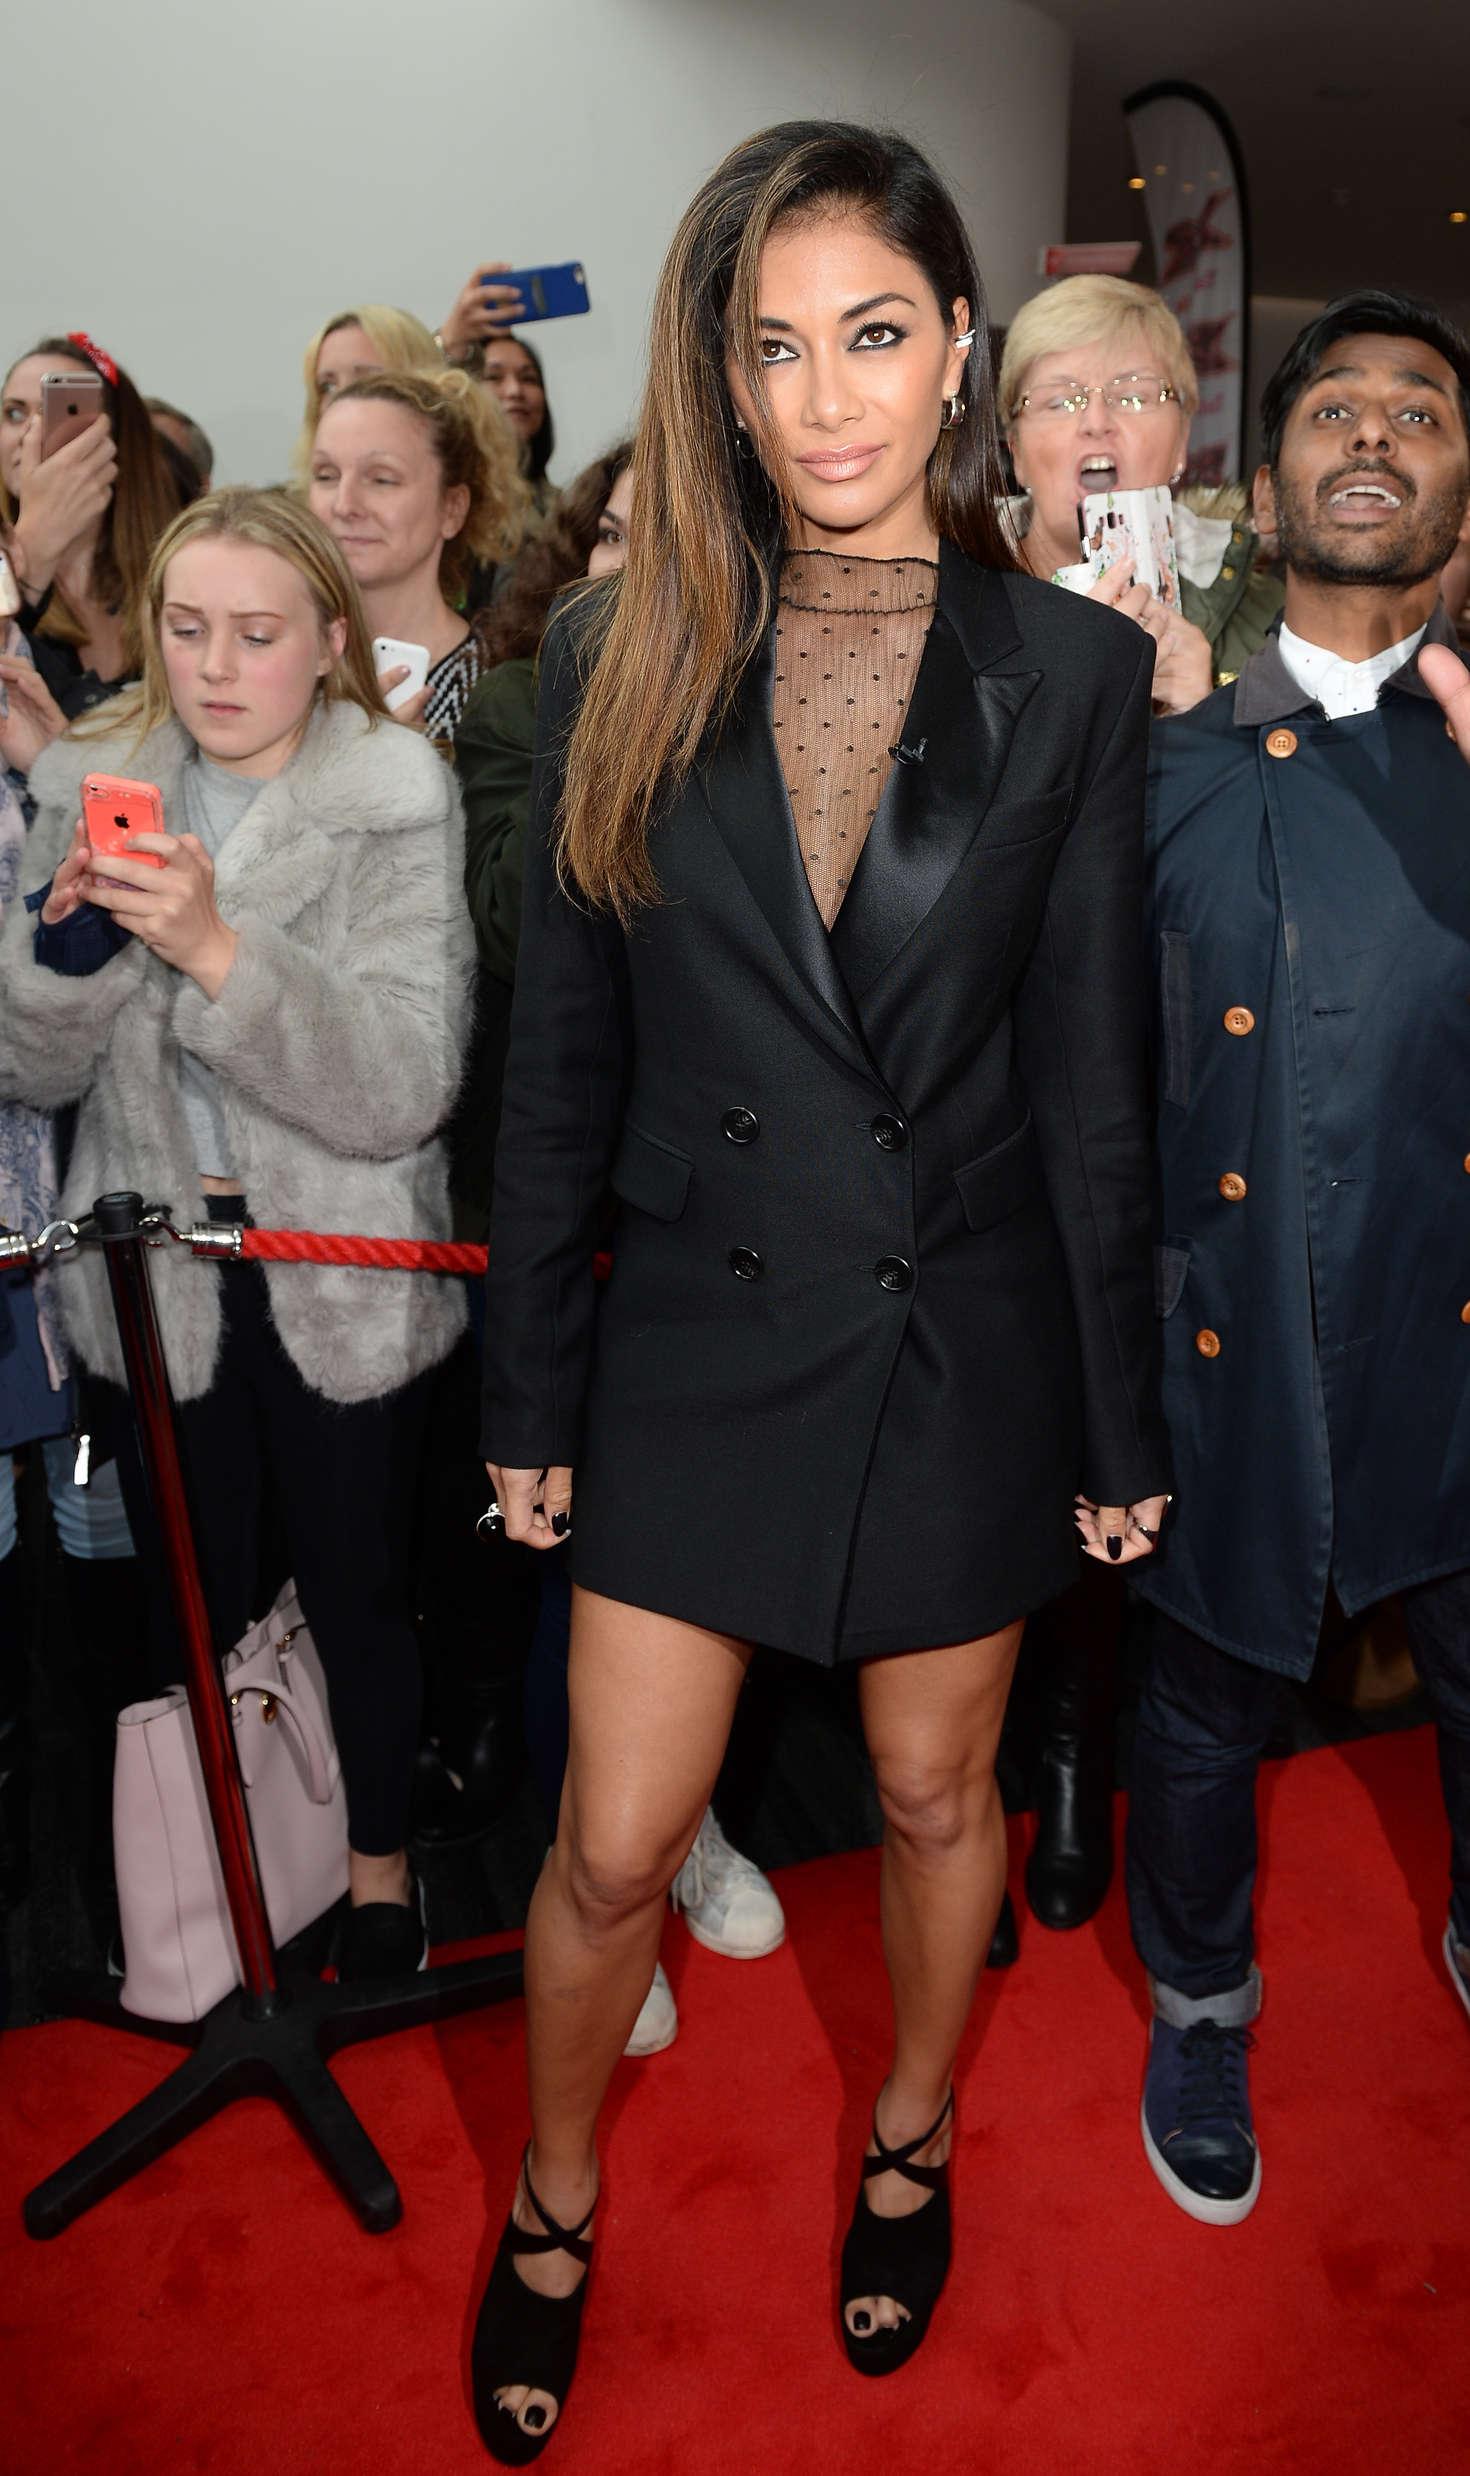 Nicole Scherzinger - Arrives for X Factor in Manchester